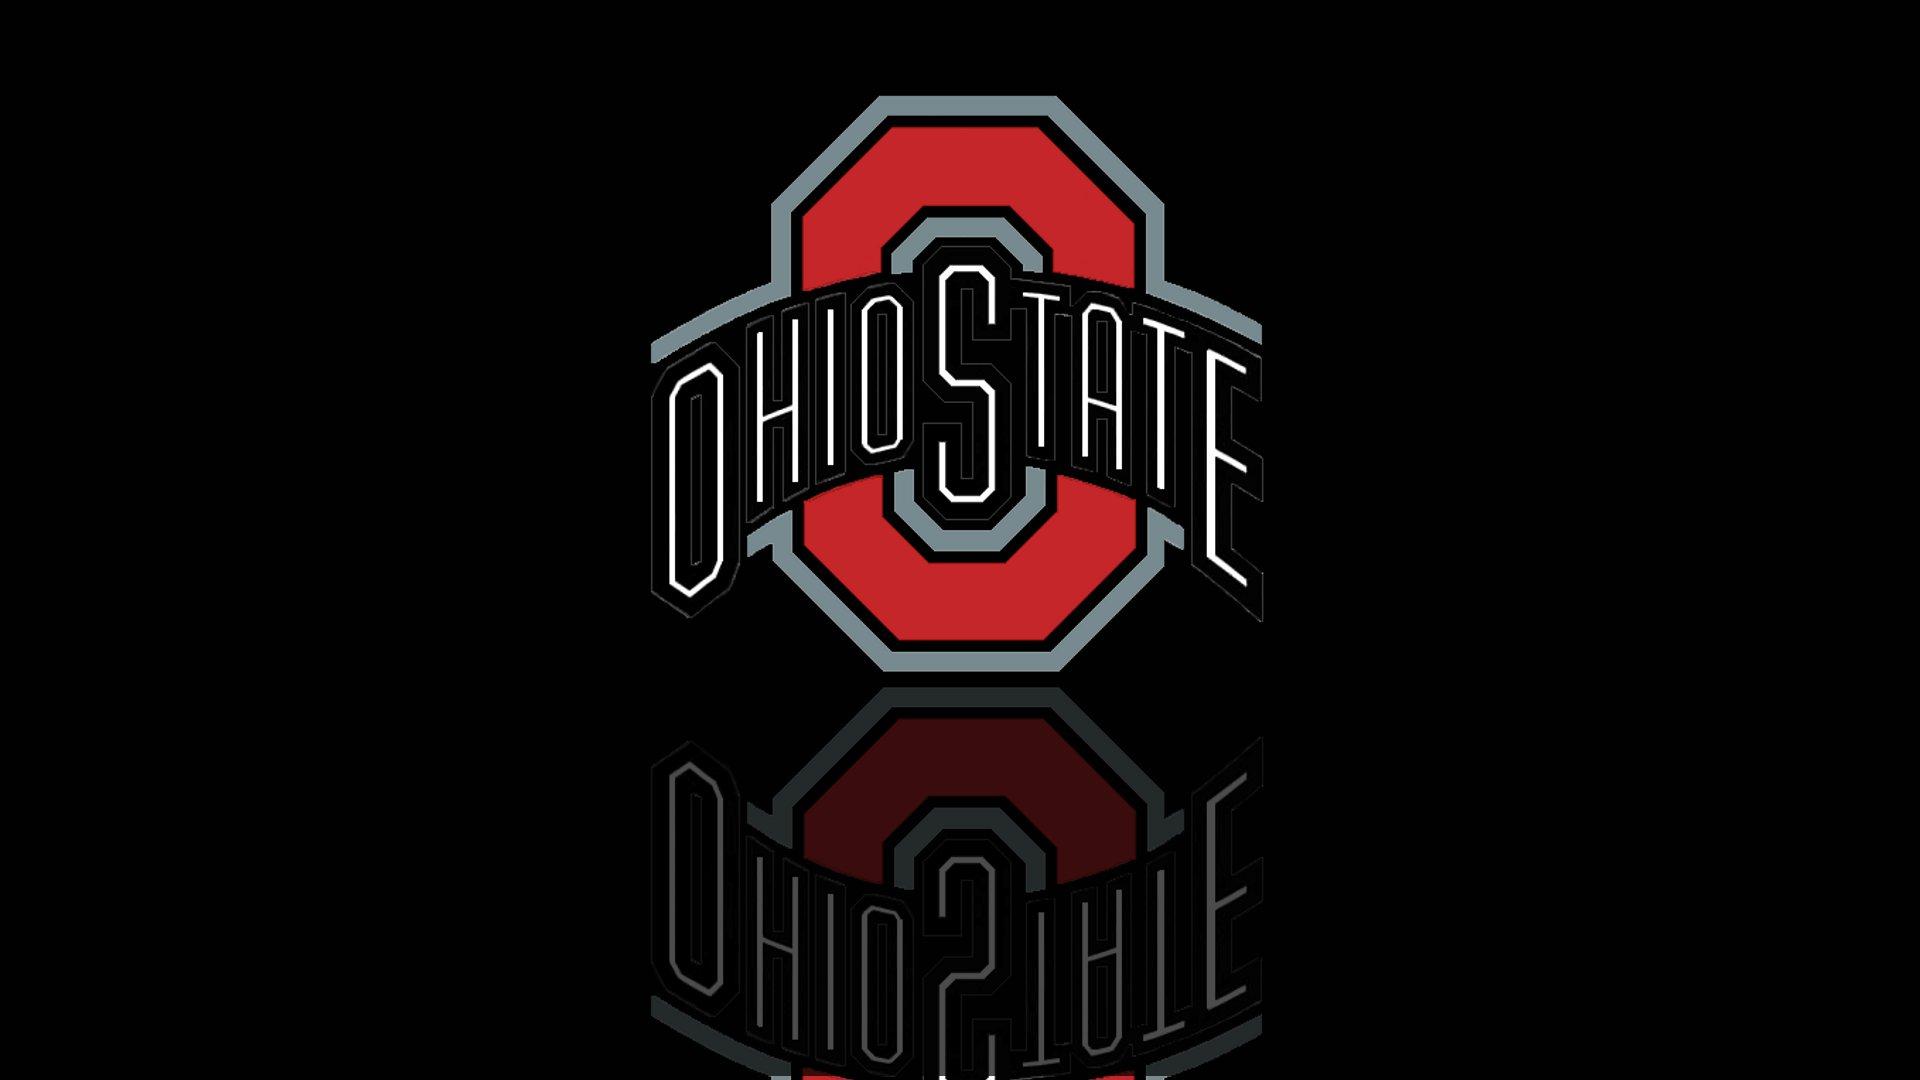 Ohio State 2 - Ohio State Football Wallpaper (28723995) - Fanpop